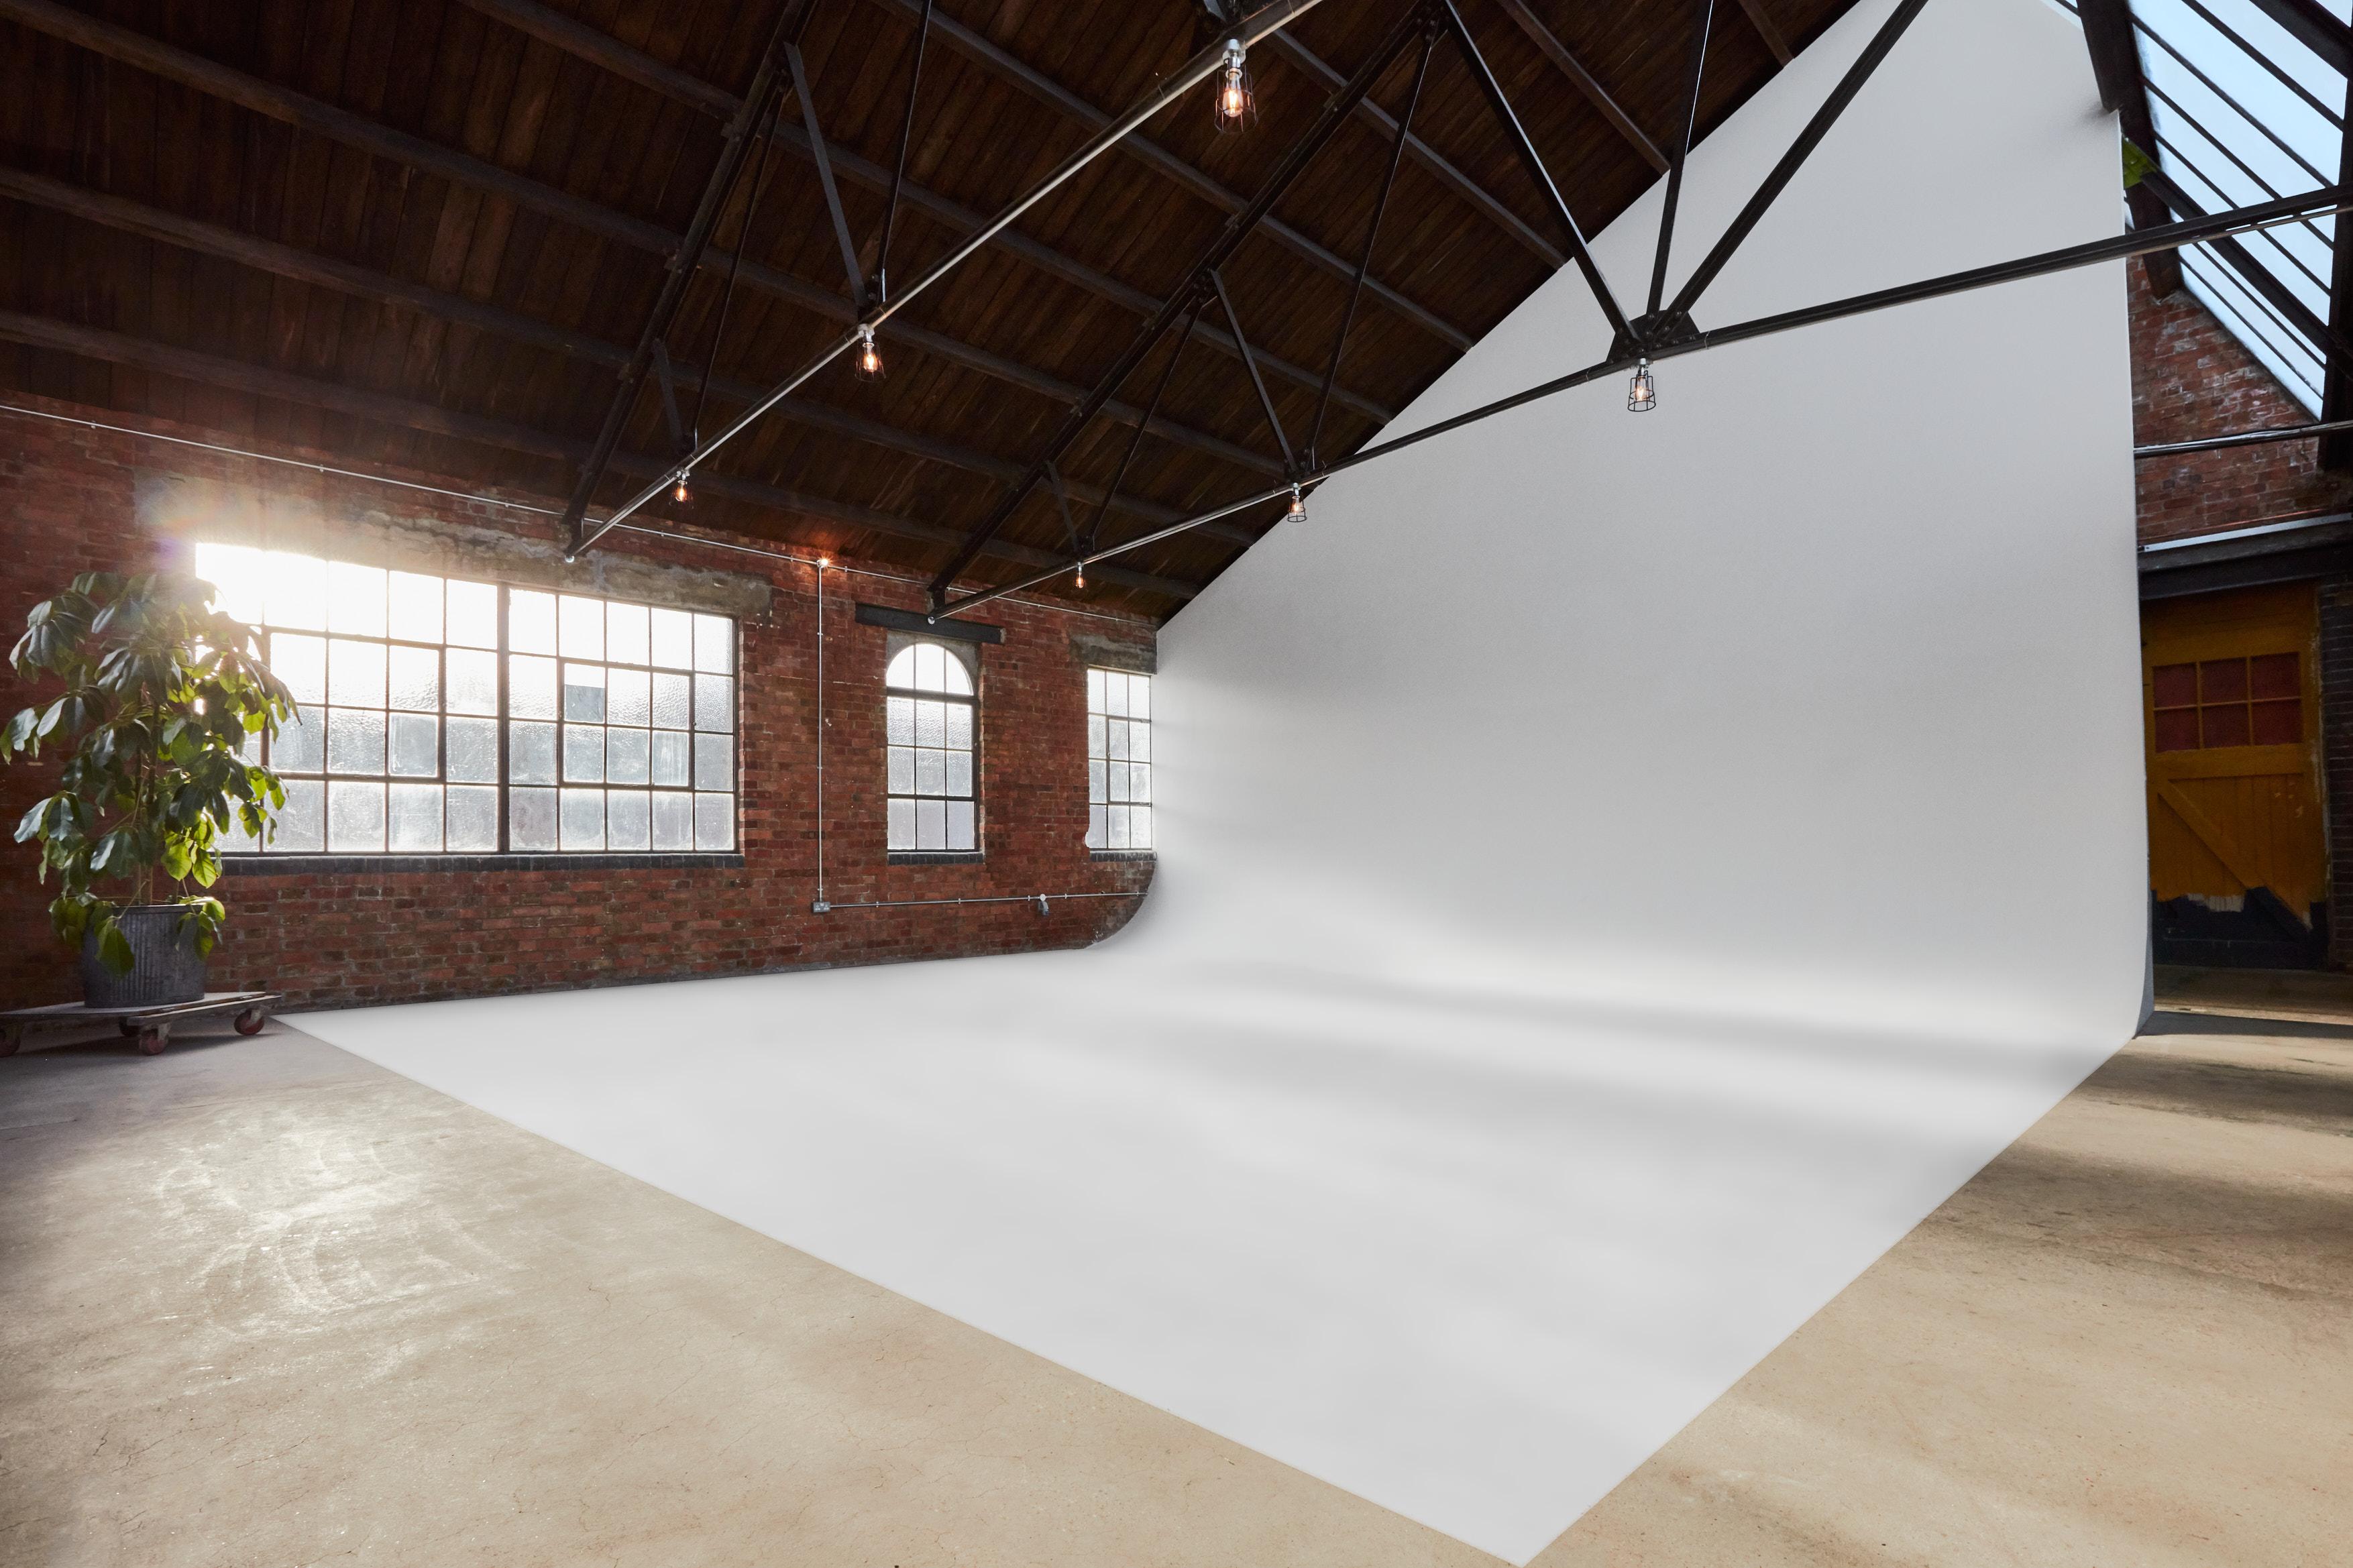 creative photo studio with angled curved wall